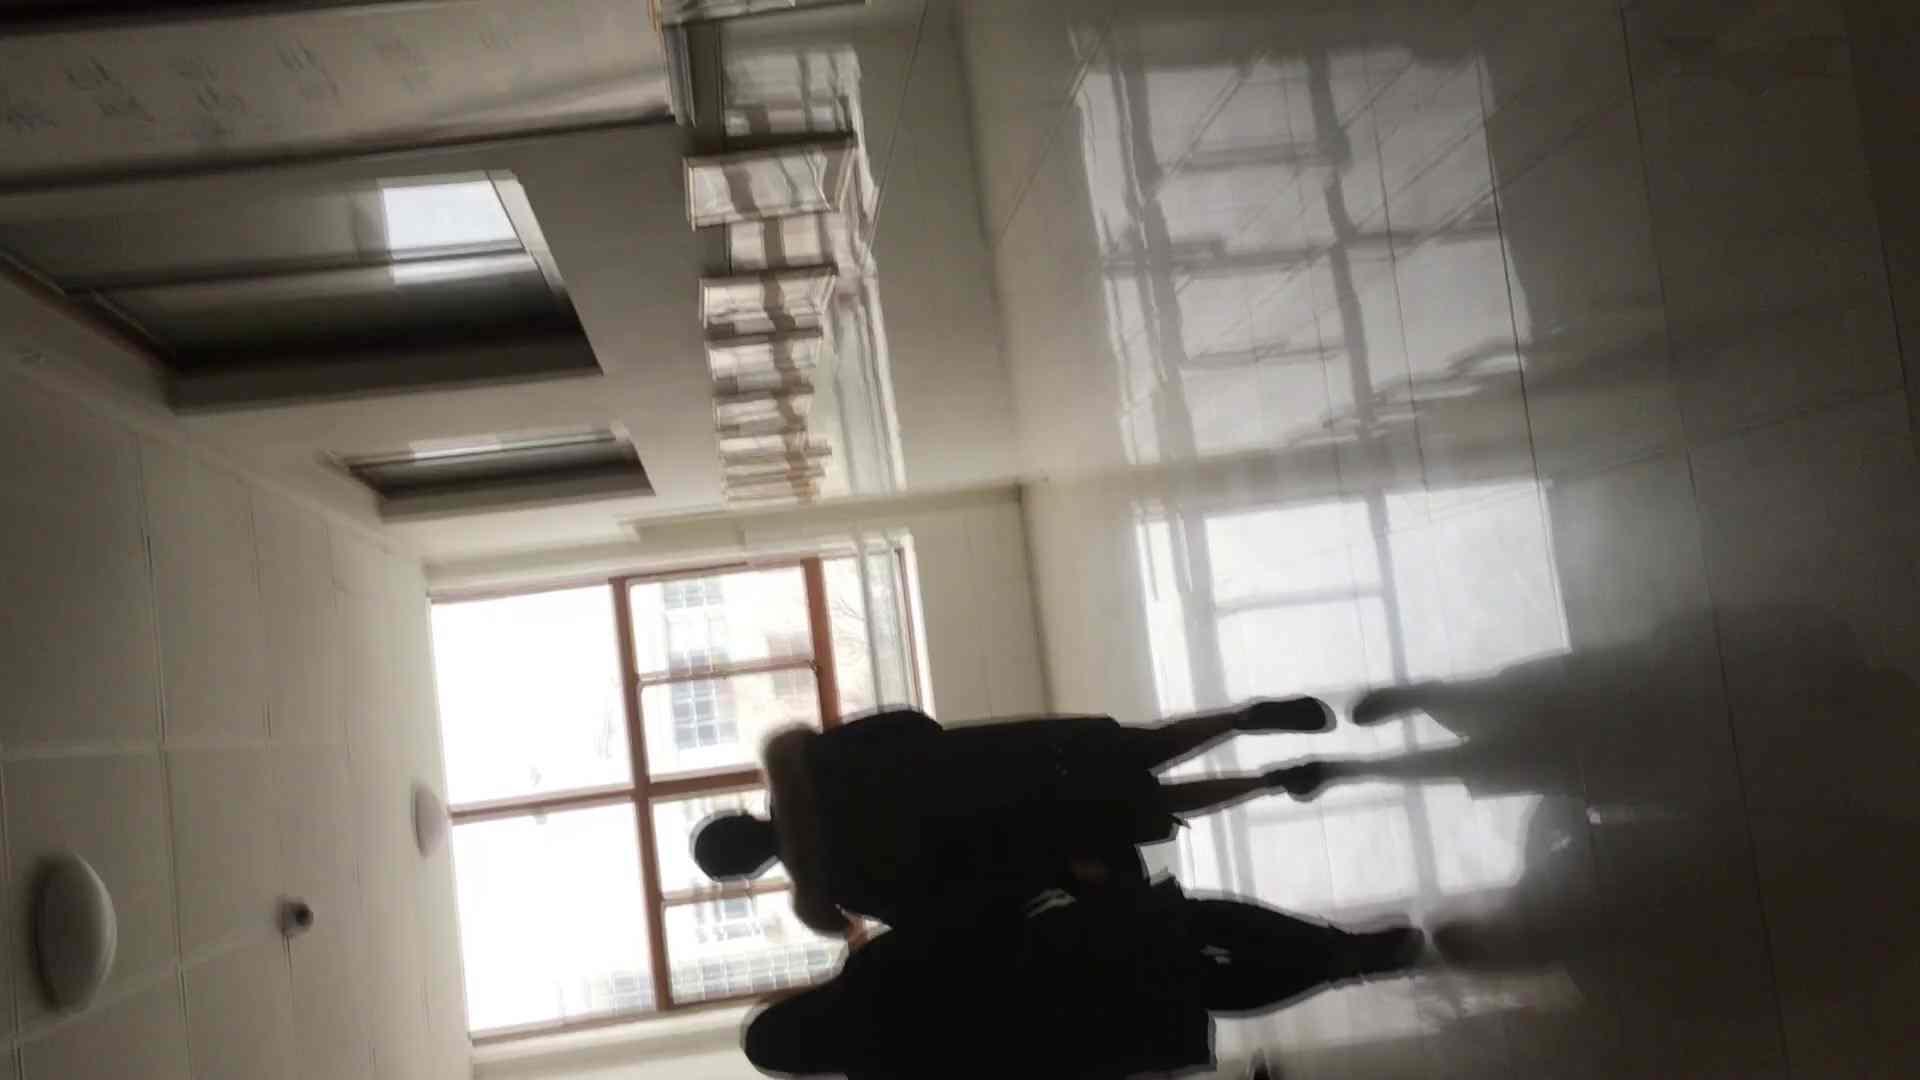 芸術大学ガチ潜入盗撮 JD盗撮 美女の洗面所の秘密 Vol.94 盗撮映像大放出 えろ無修正画像 25連発 21